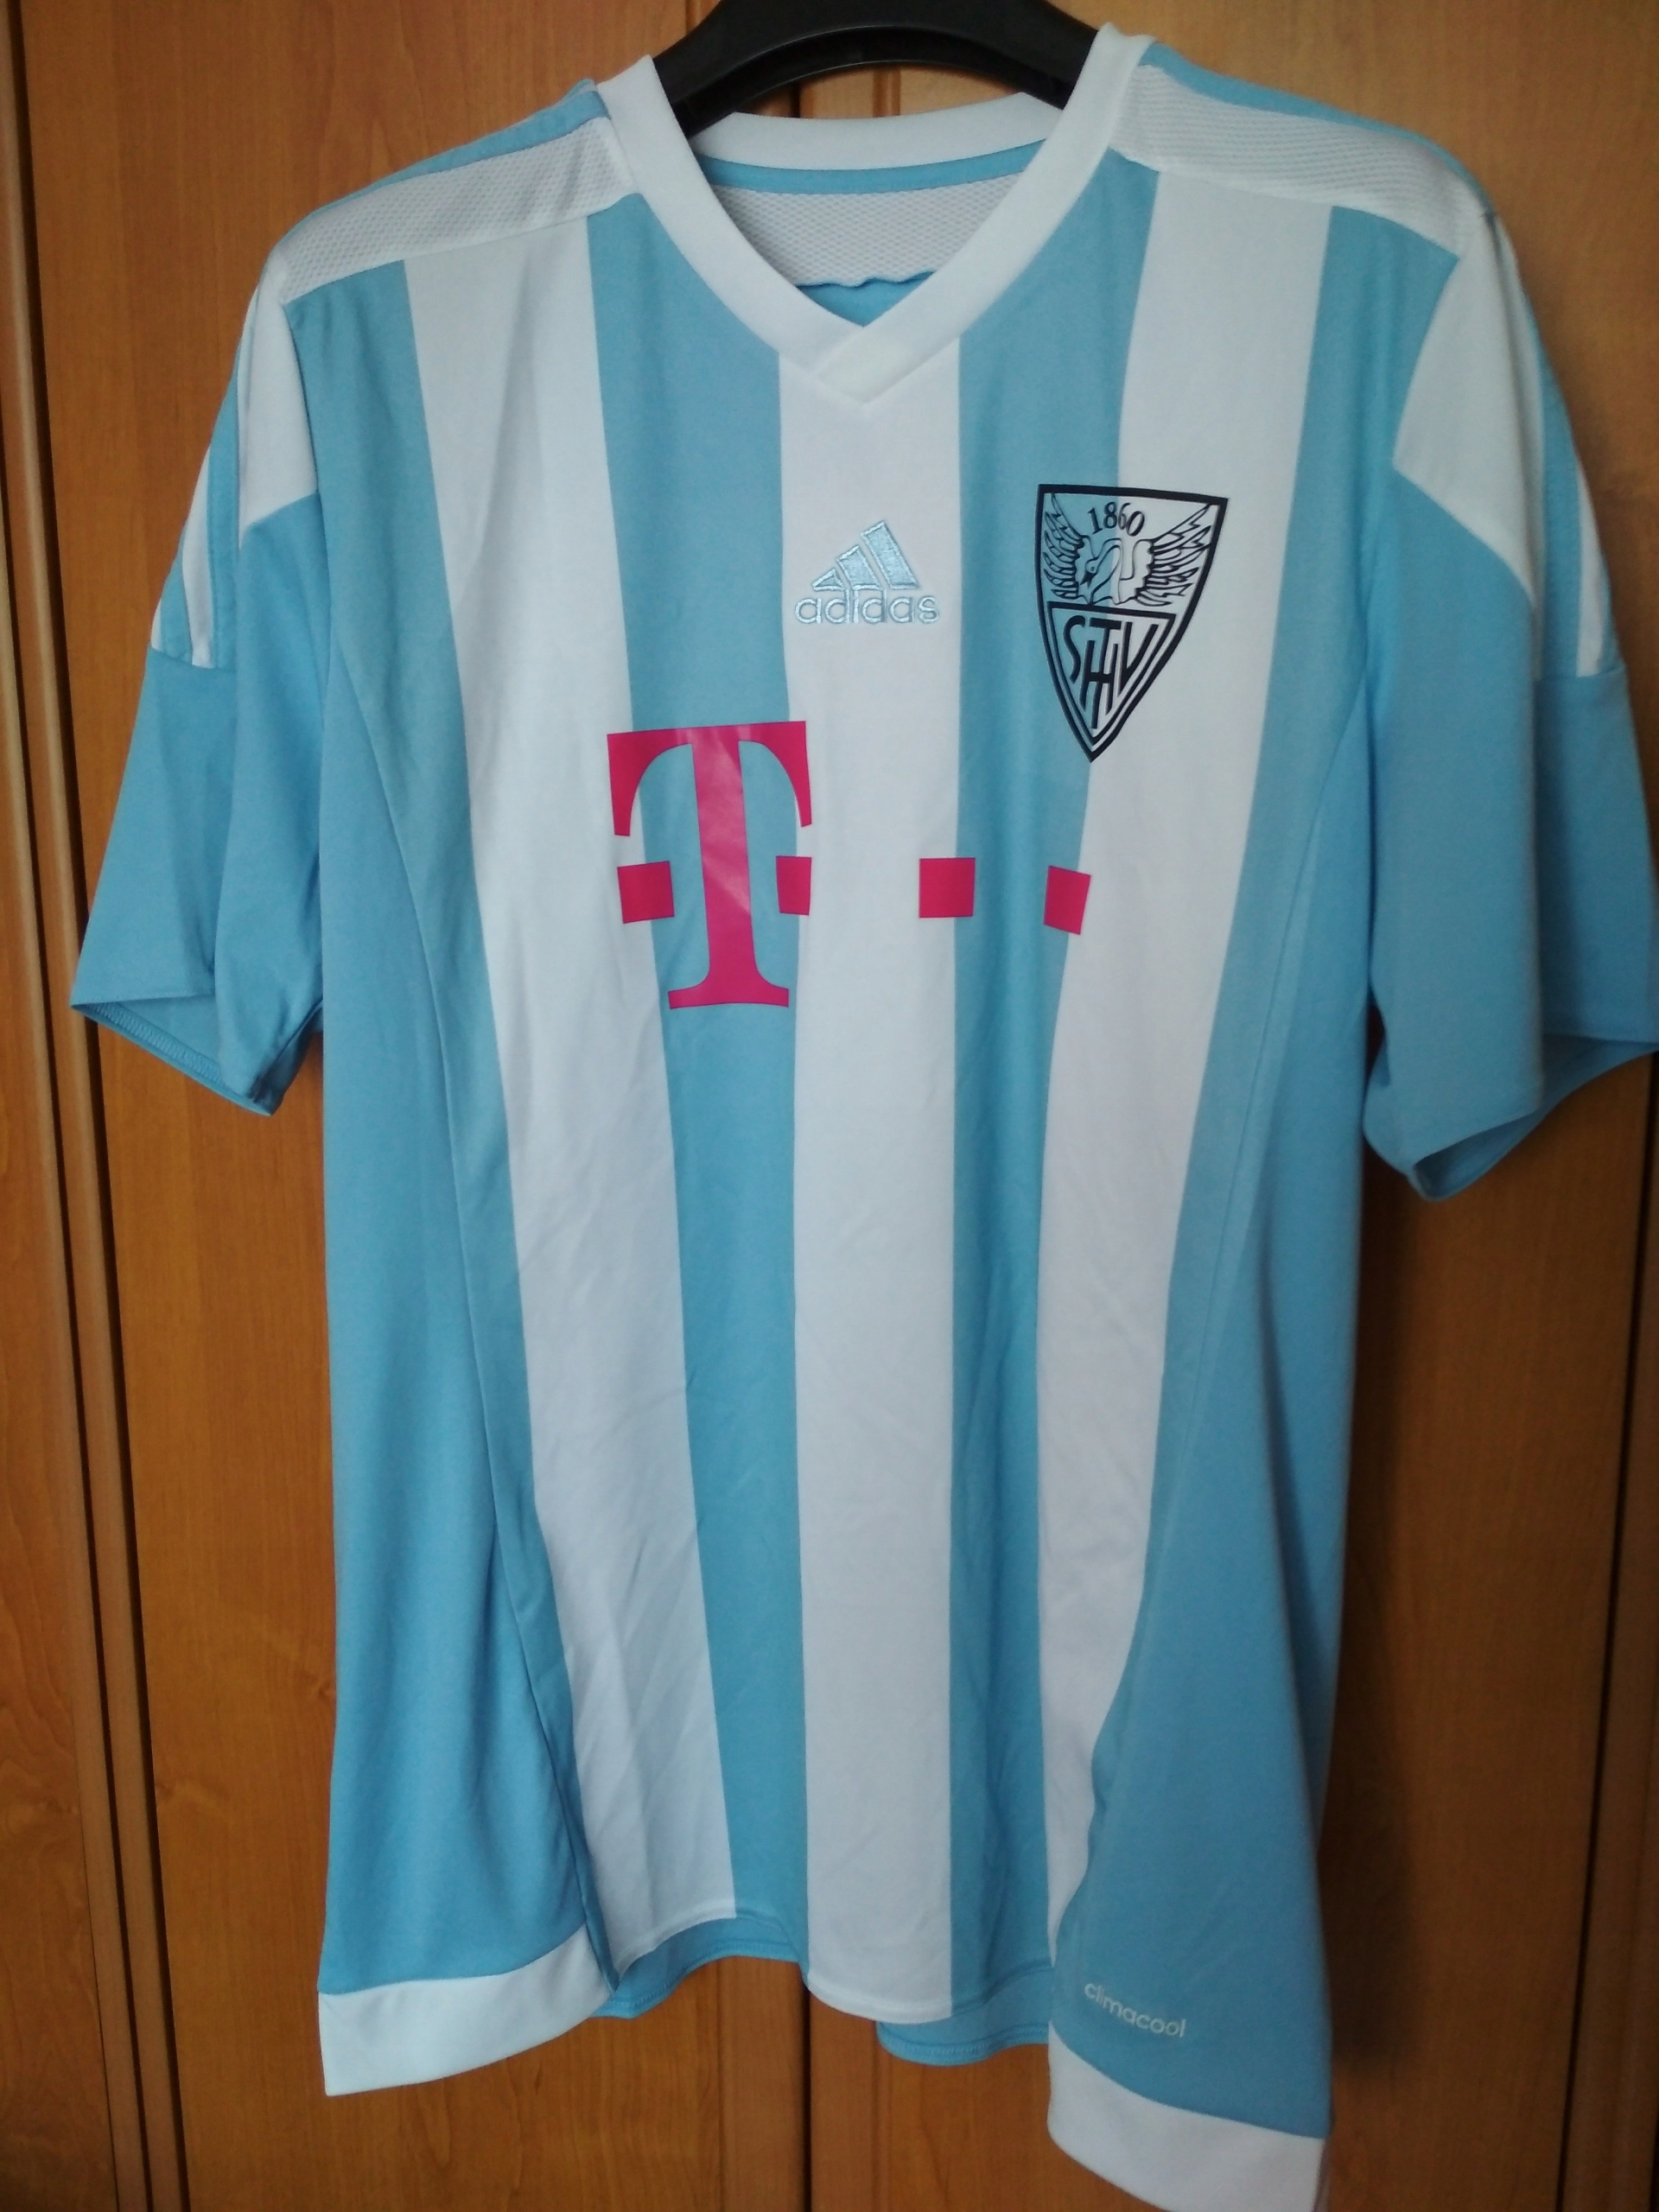 Koszulka - TSV Hanau - Adidas - L - Aytekin